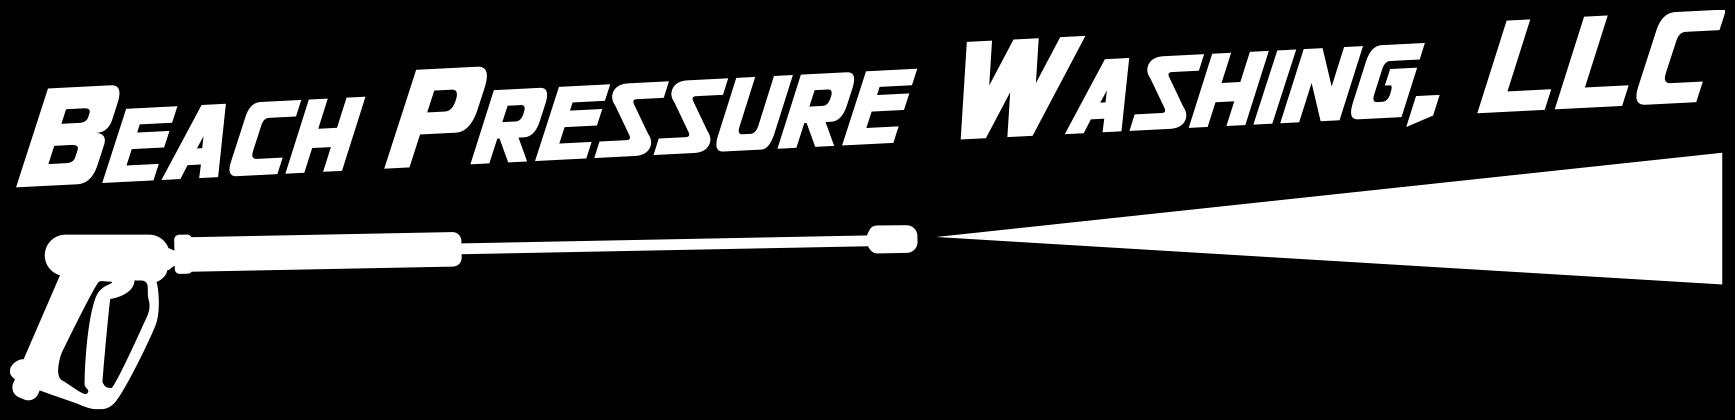 Beach Pressure Washing Logo White